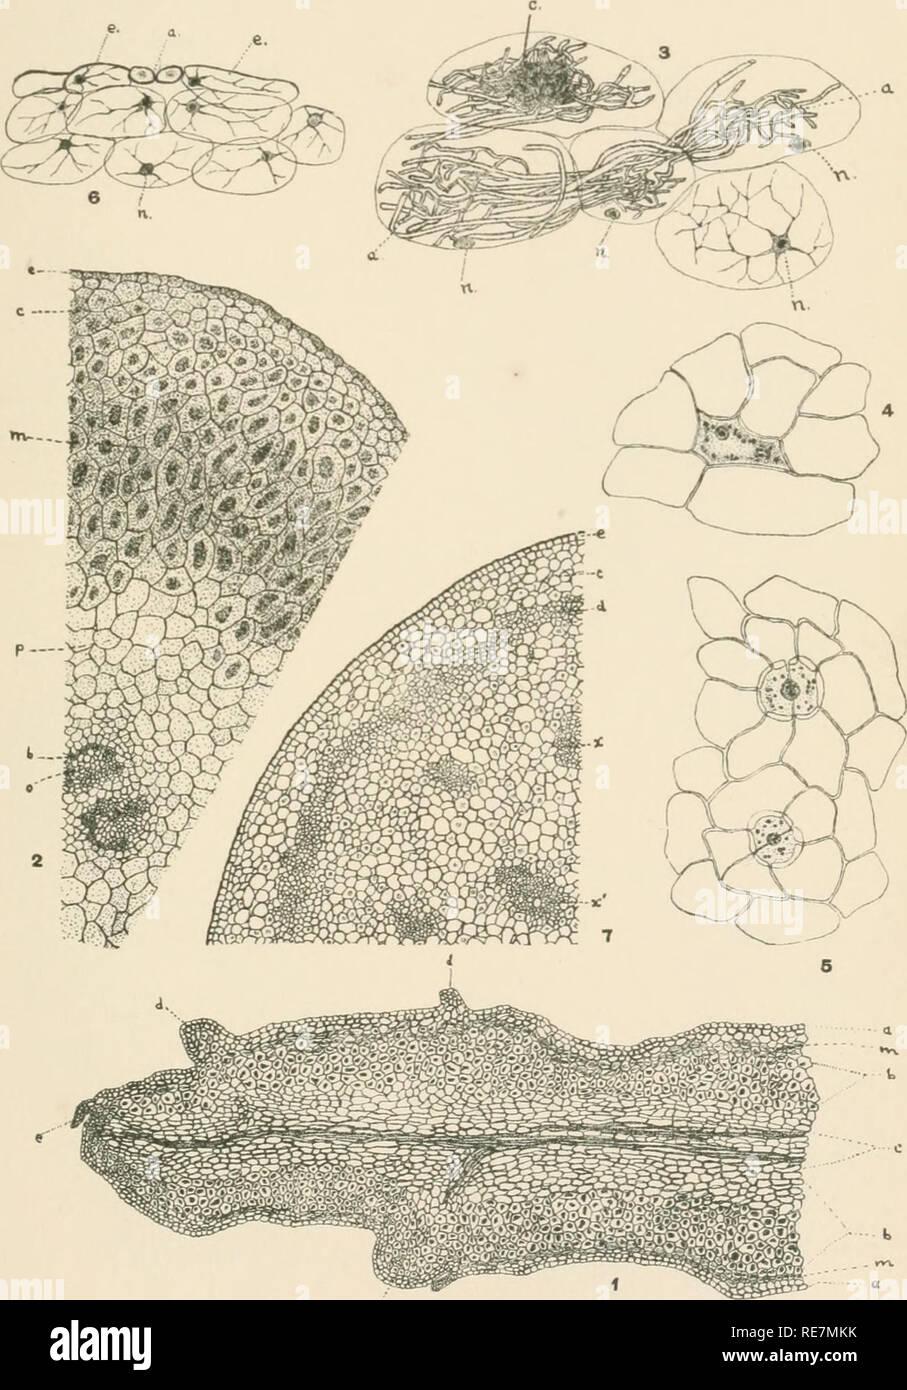 Map Of New York Botanical Garden.Contributions From The New York Botanical Garden Plants Bull Torr